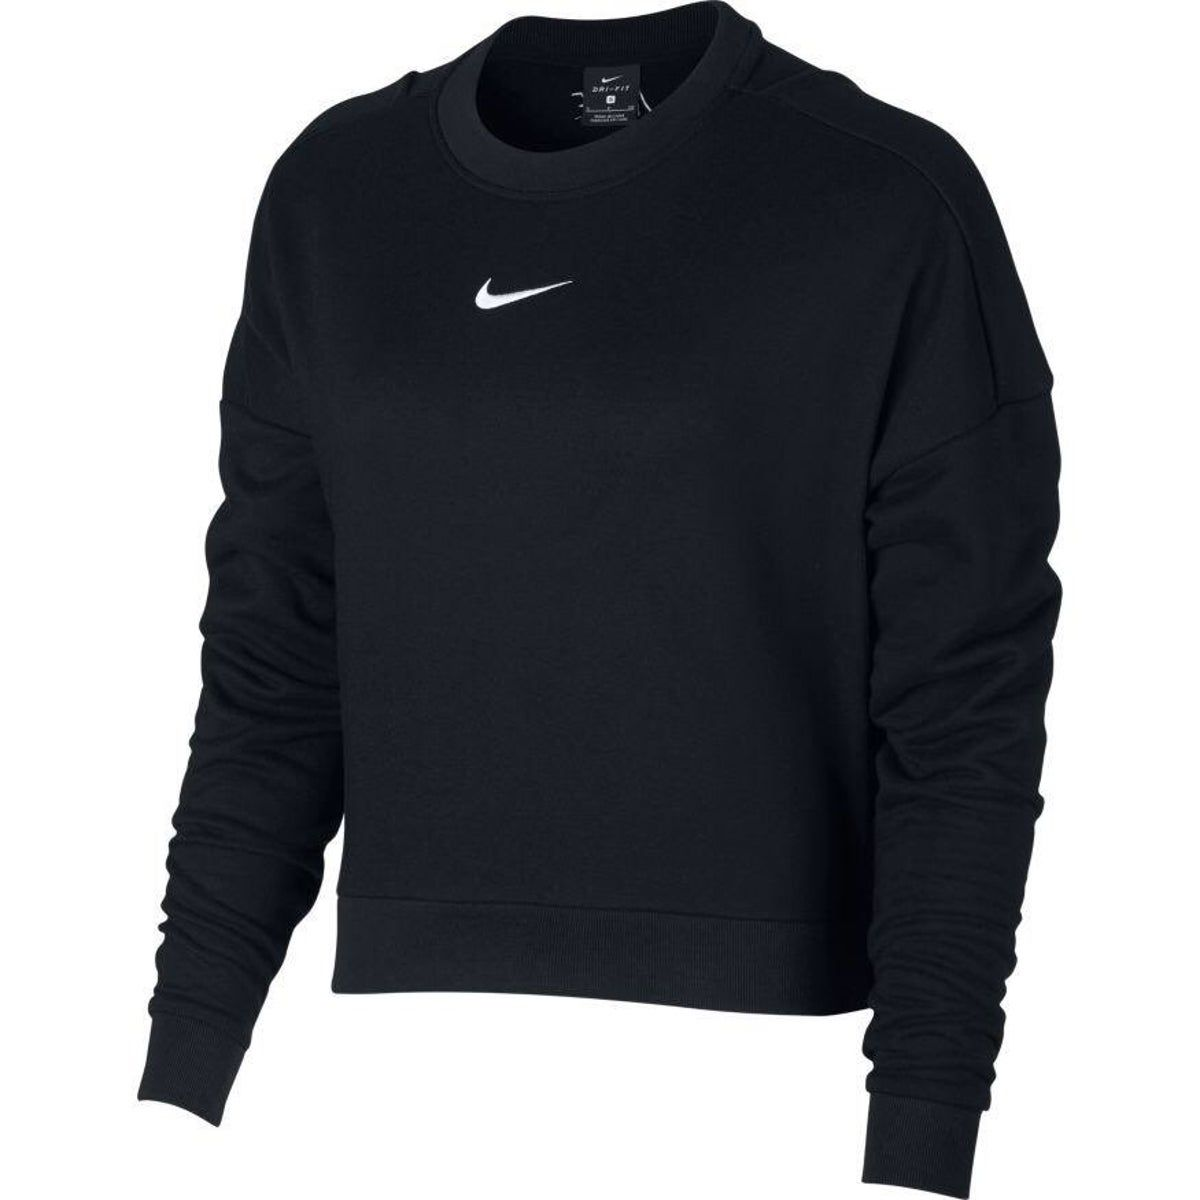 Nike Cropped Sweatshirt Training Tops Sweatshirts Nike Cropped Sweatshirt [ 1200 x 1200 Pixel ]